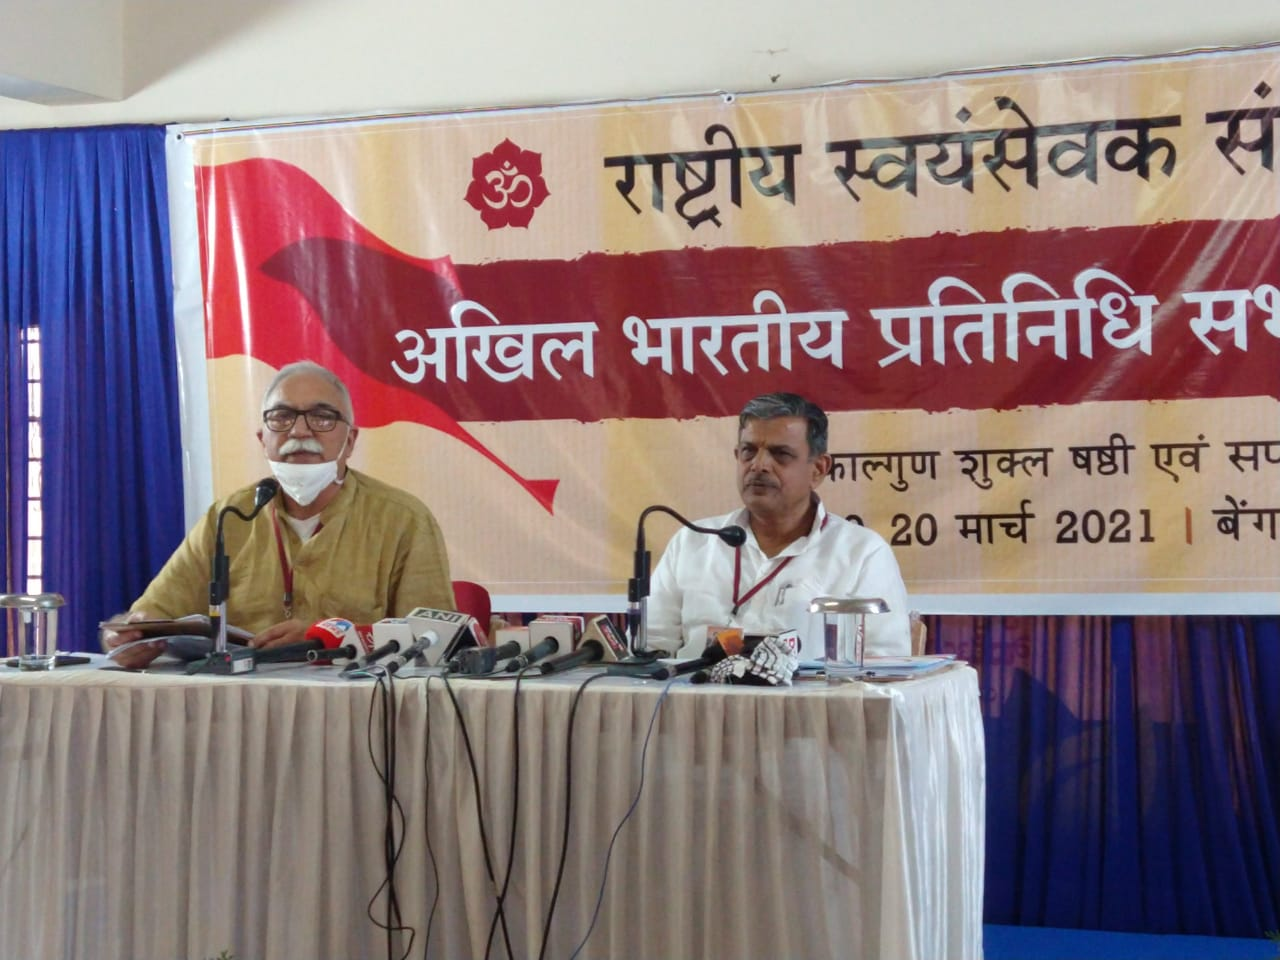 Sangh and Swayamsevaks to work towards inculcating Family Values, Environmental issues and Social Harmony – RSS Sarkaryavaha Dattatreya Hosabale